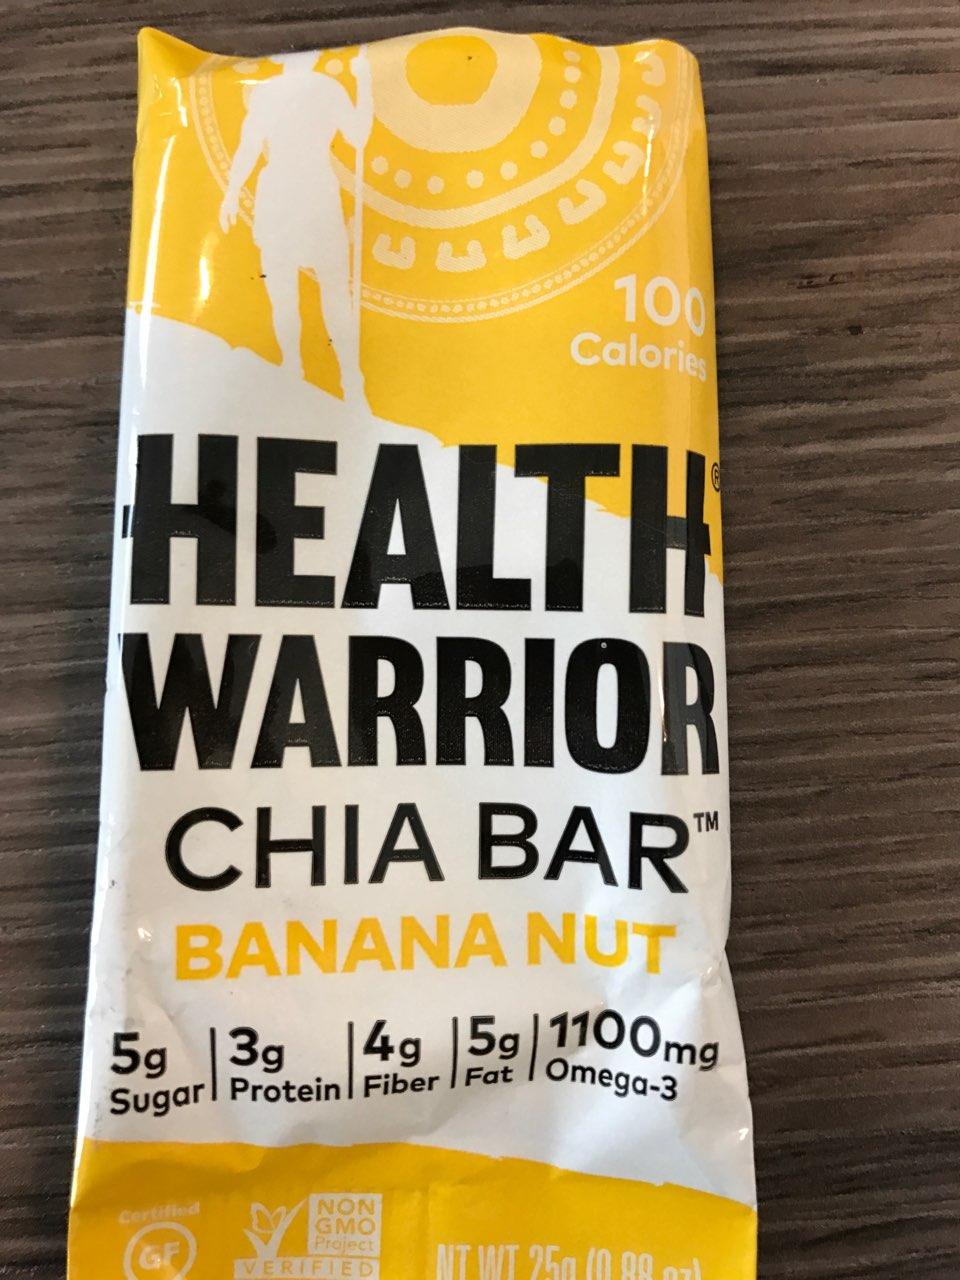 Health Warrior Banana Nut Chia Bar Calories Nutrition